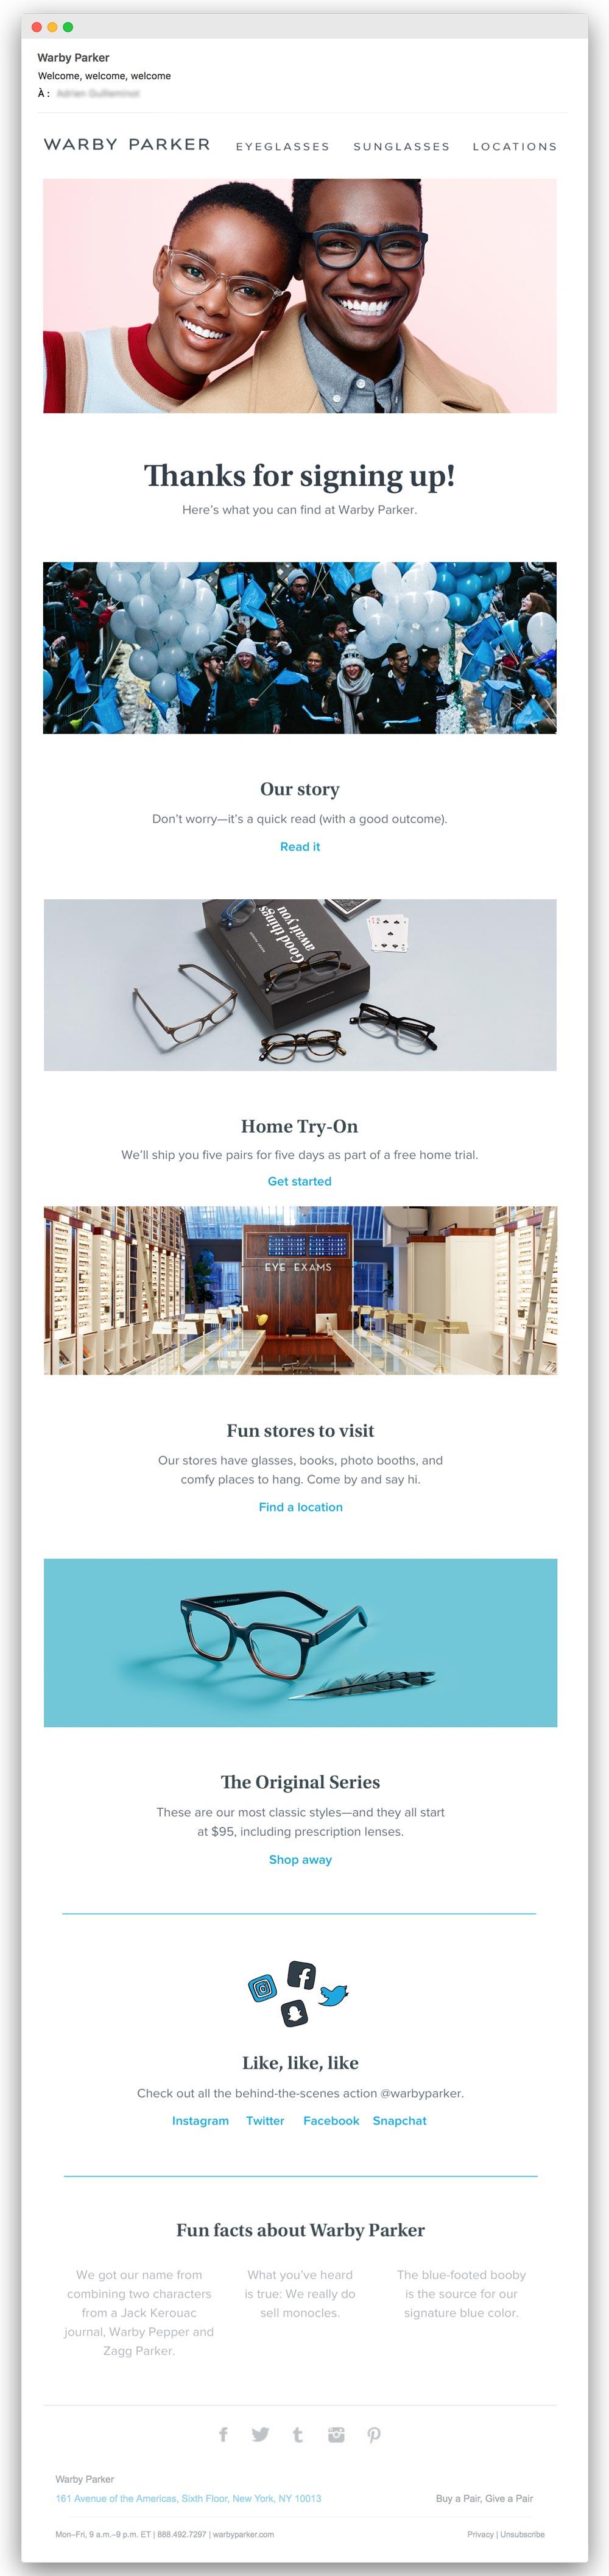 Email trigger : exemple d'email de bienvenue Warby Parker